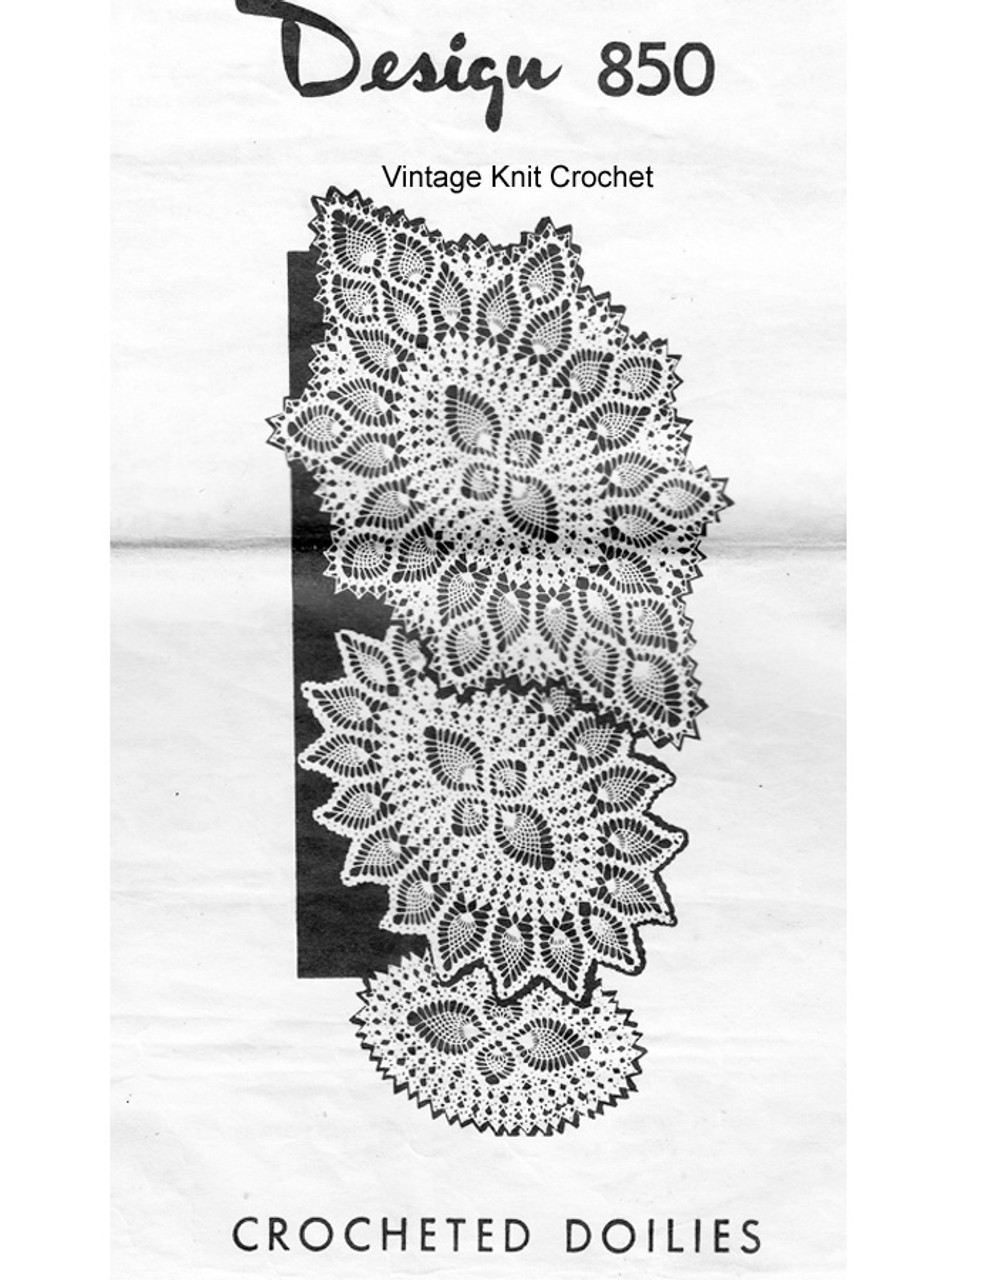 Pineapple border crochet doilies pattern, Mail Order Design 850